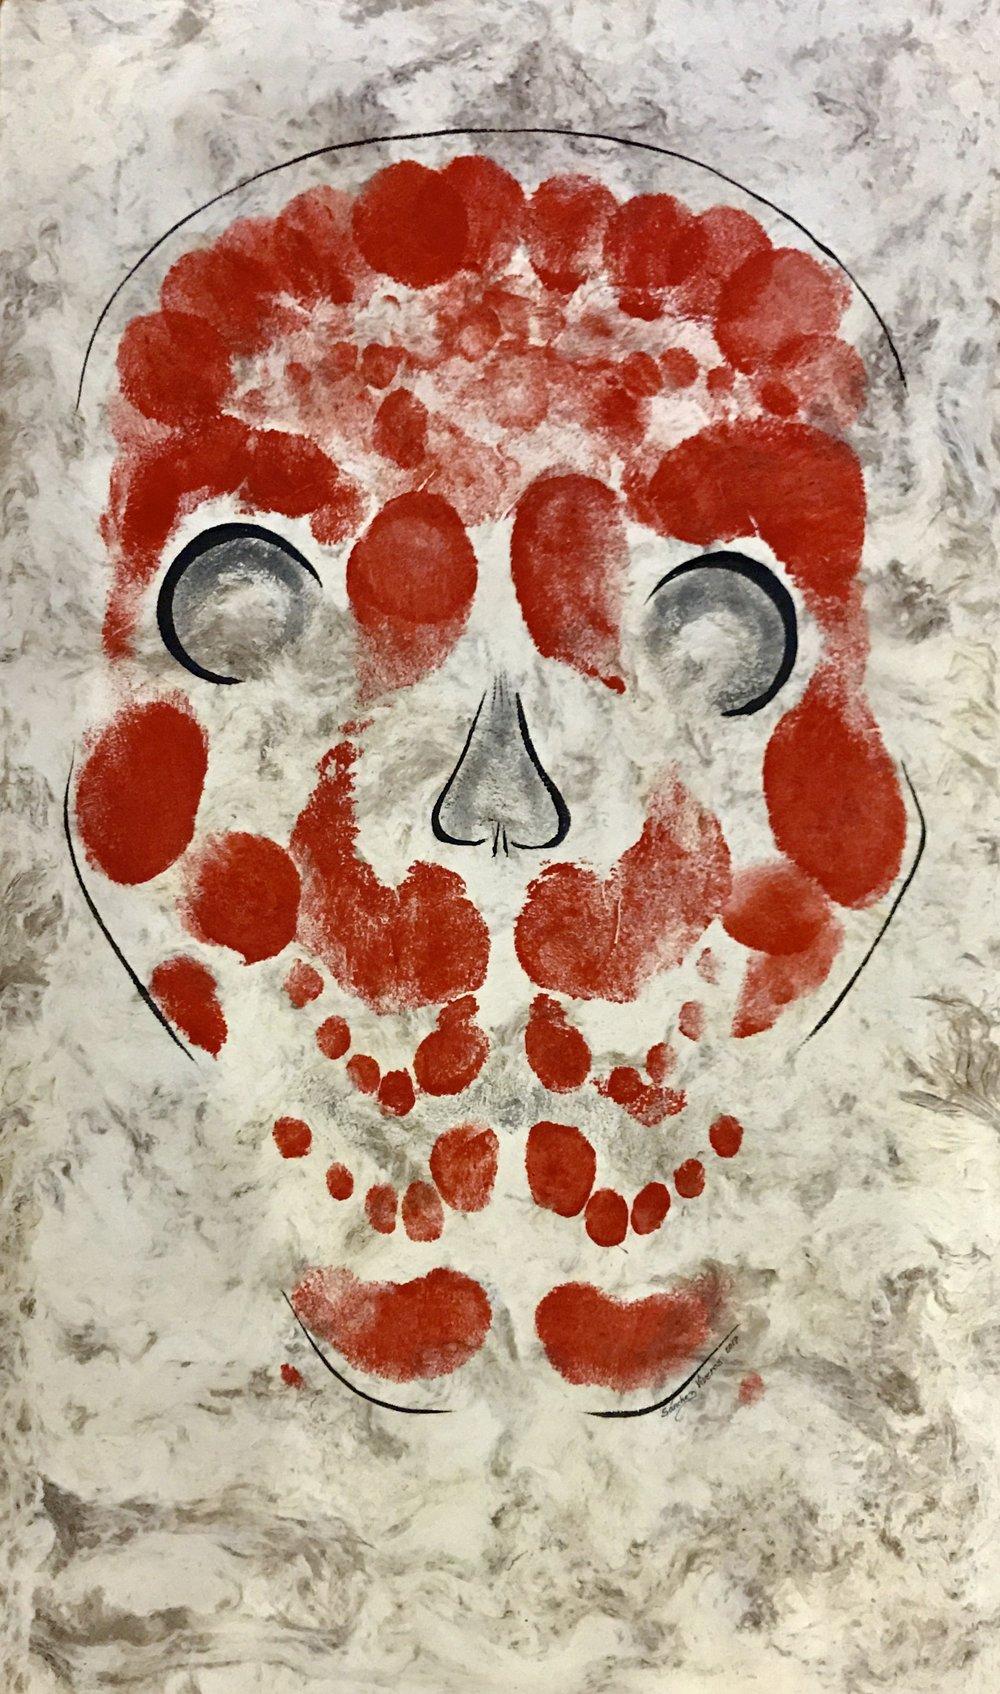 Calapatas , 2017  Pintura Corporal Acrílica sobre Papel Amate  70.5 x 40.5 cm